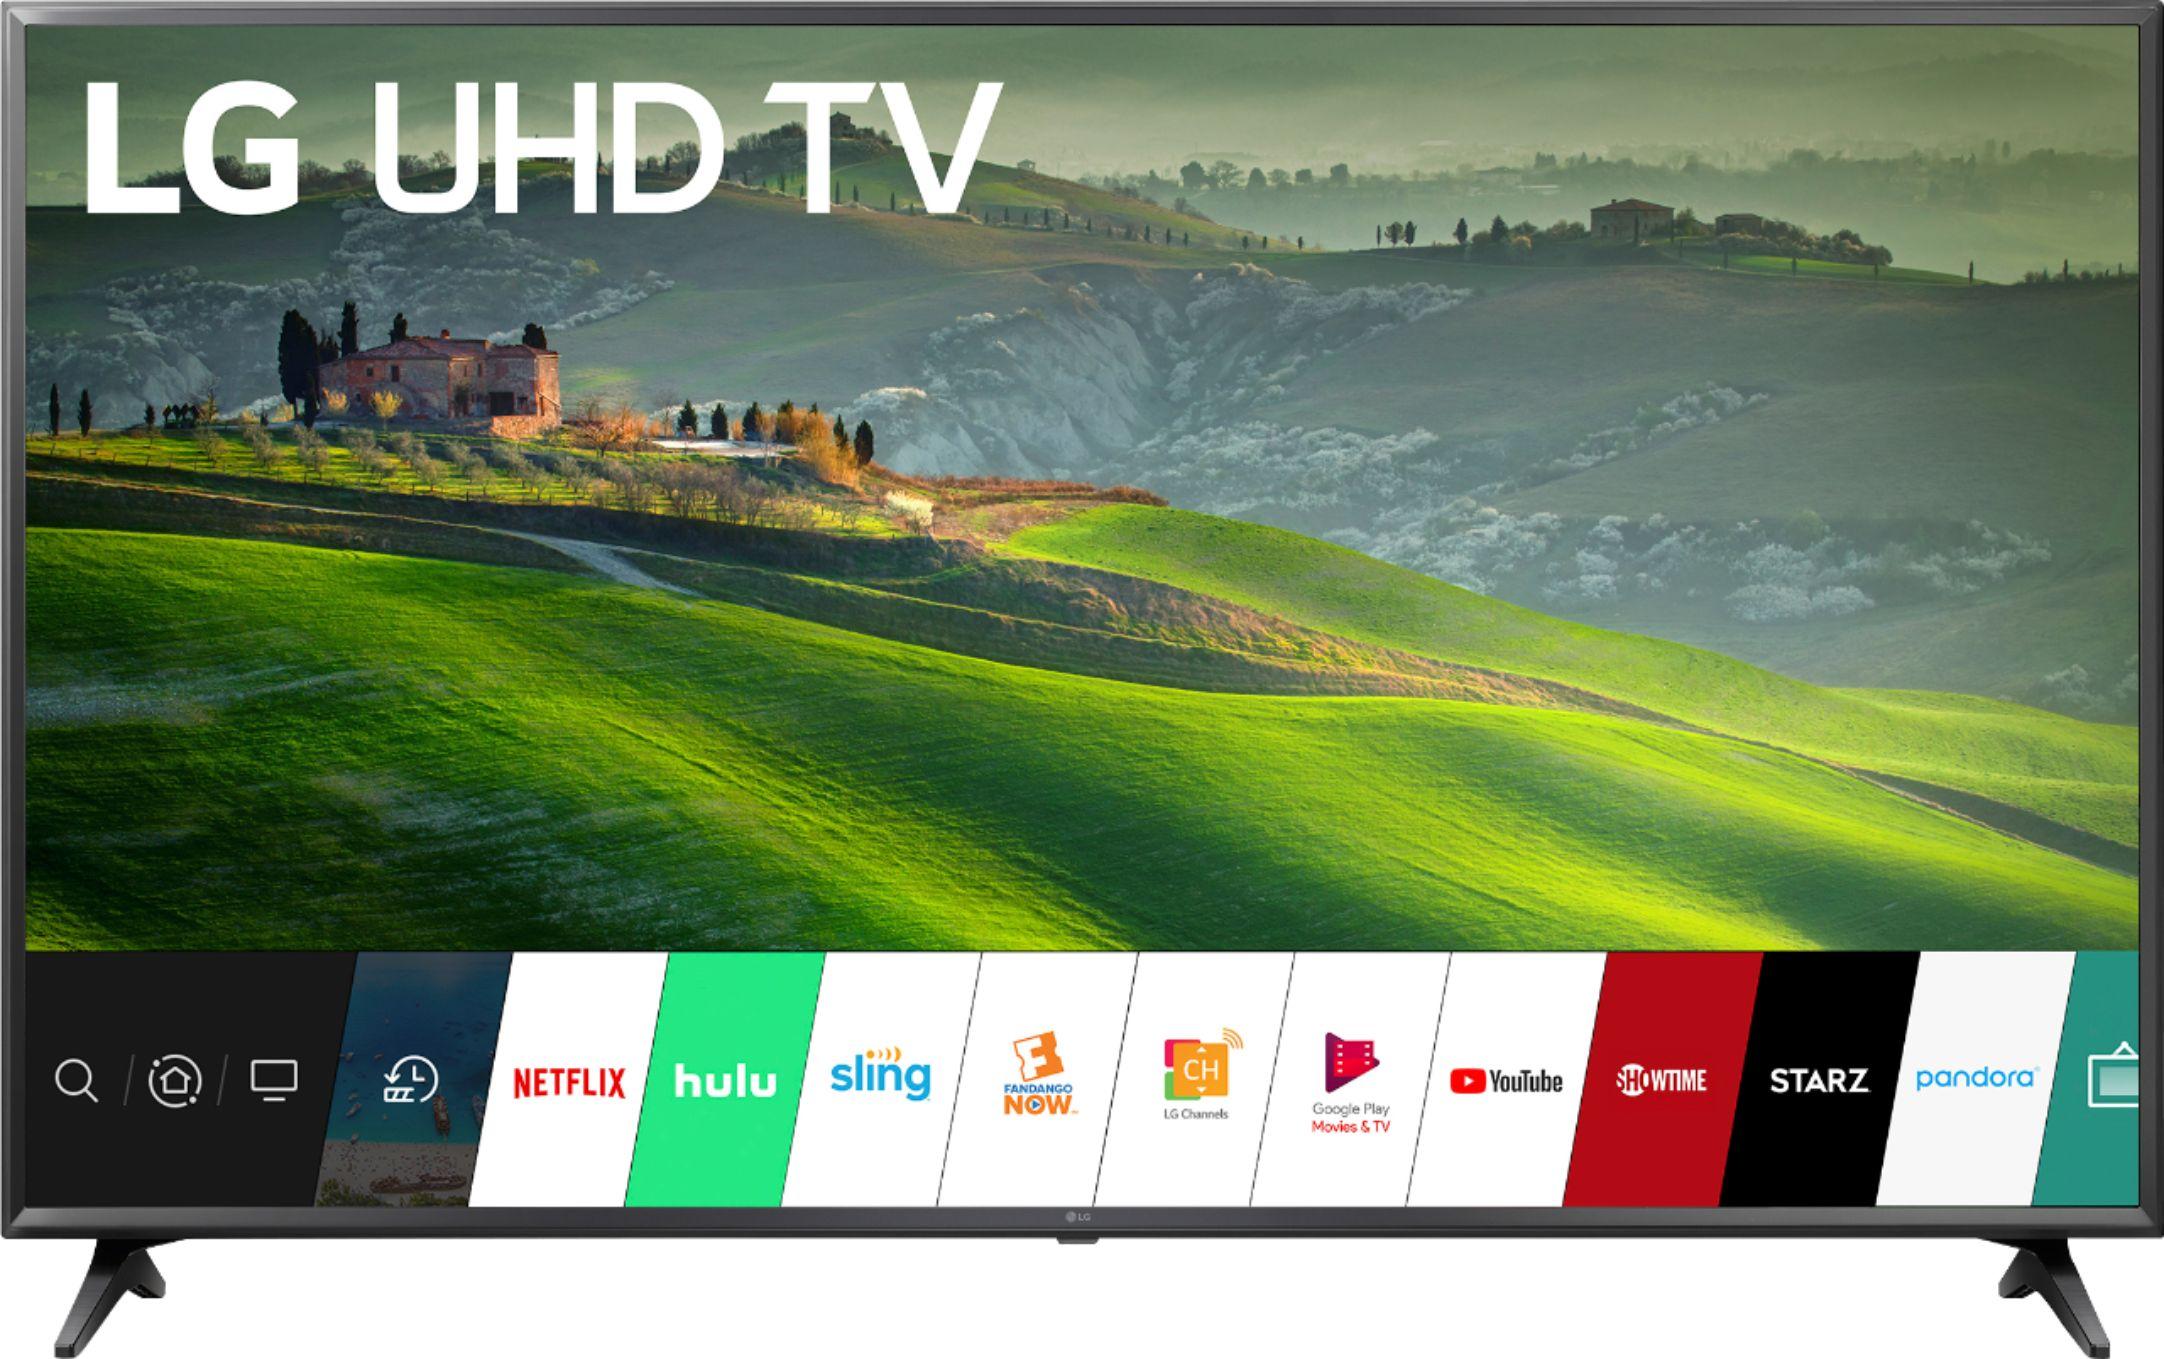 LG 65' 4k Smart TV $399.99/w Coupon at Shop-Rite  1/19-1/25